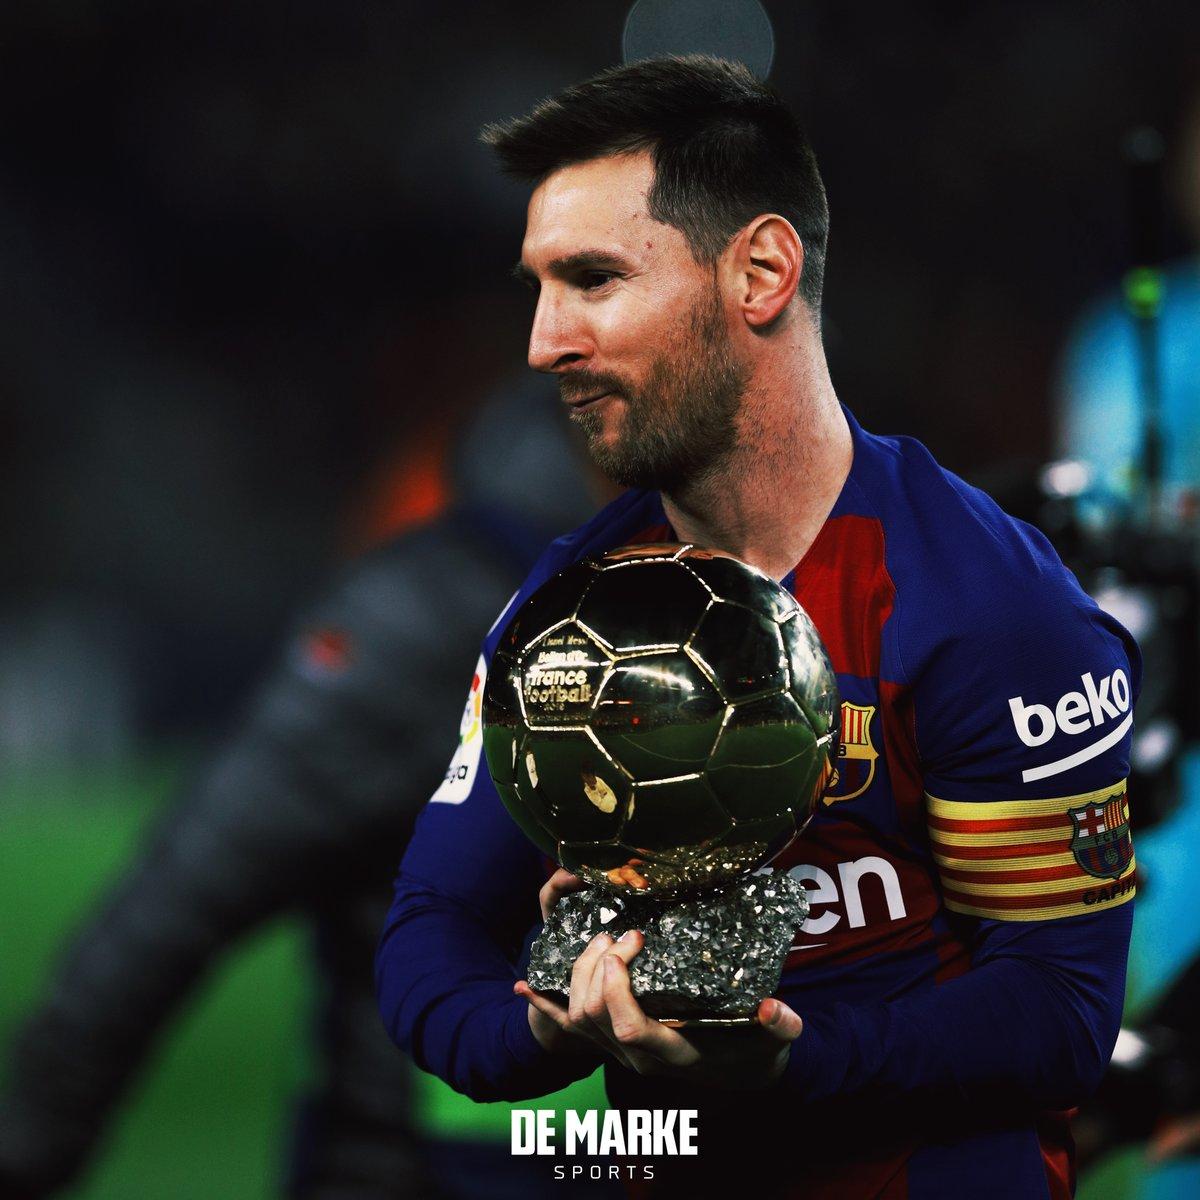 #Messi #Messi #Messi #Messi #Messi #Messi